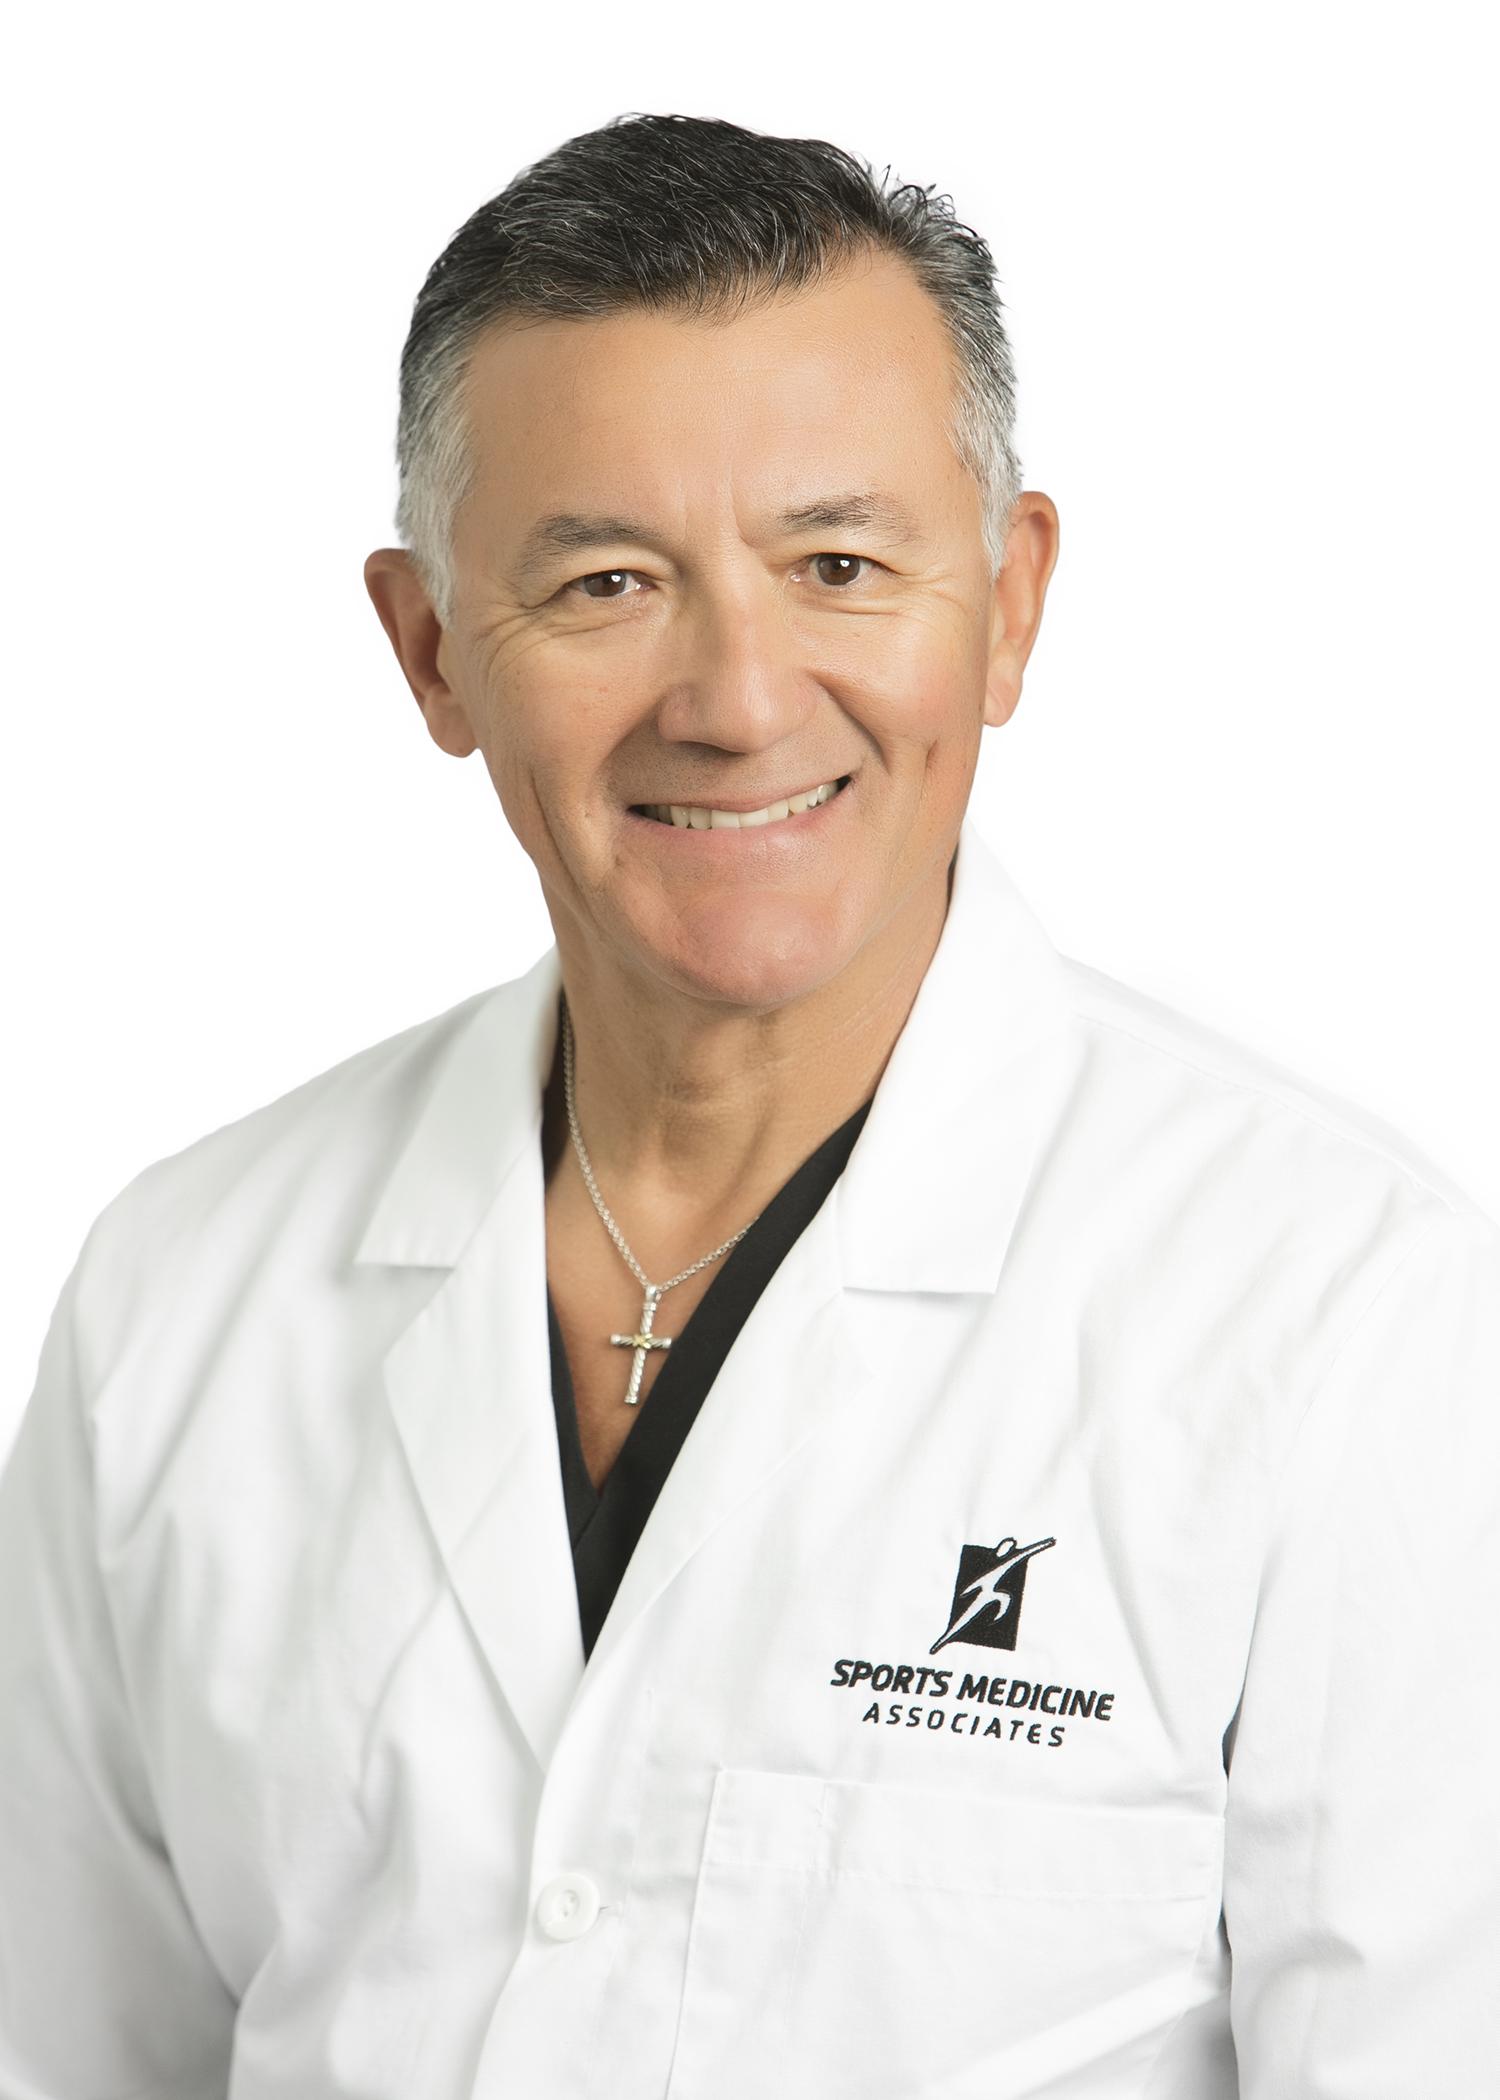 Paul Saenz, D.O. - Primary Care Sports Medicine